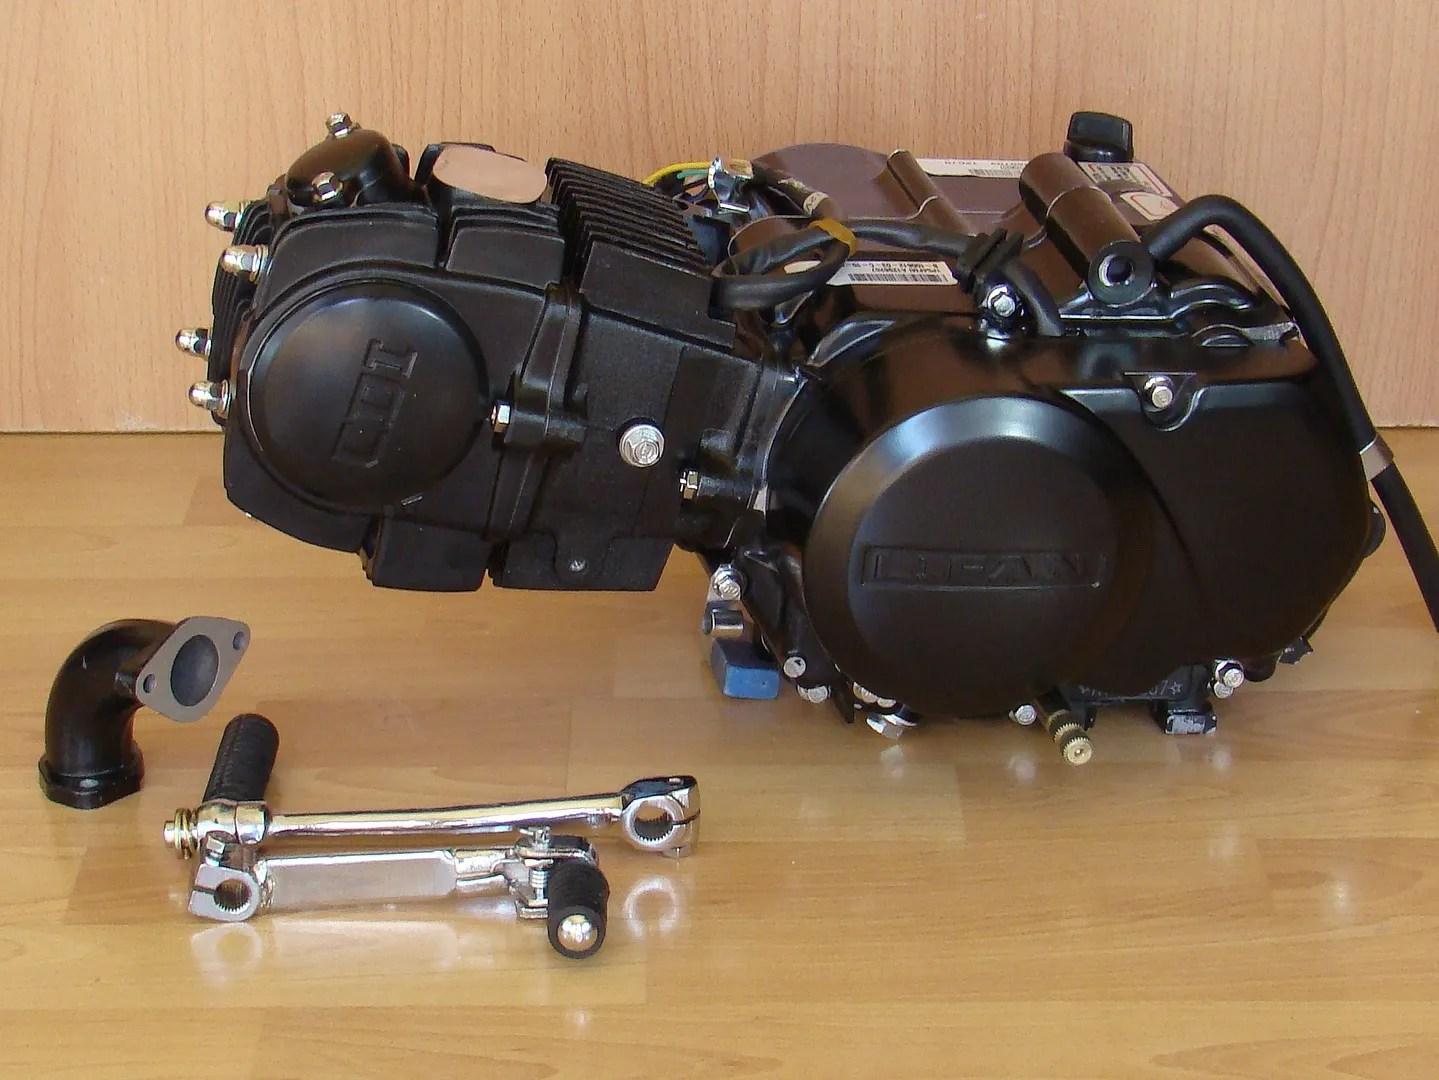 medium resolution of lifan 125cc 1p54fmi engine motor complete kit for honda xr50 crf50